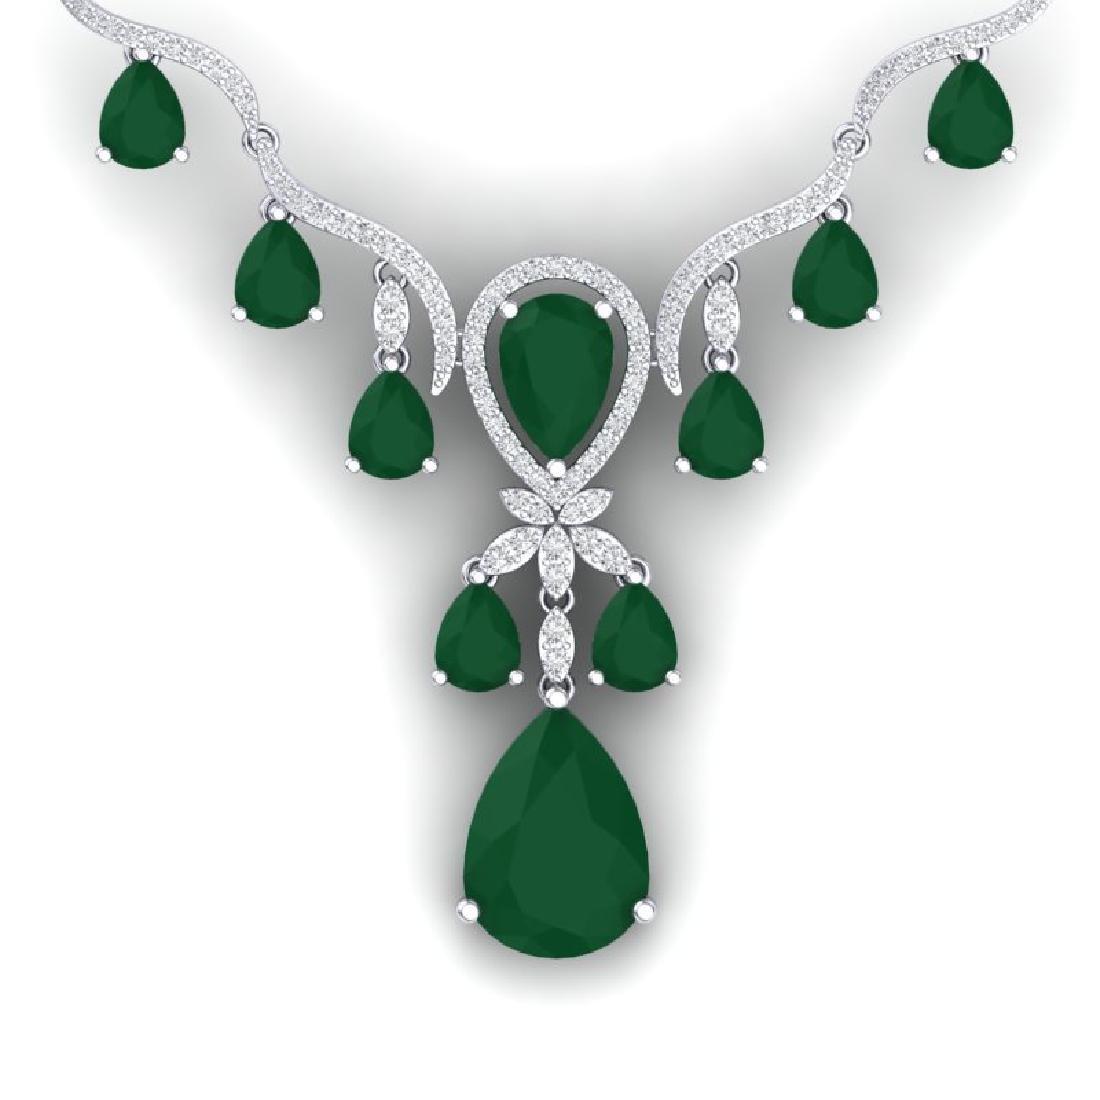 36.14 CTW Royalty Emerald & VS Diamond Necklace 18K